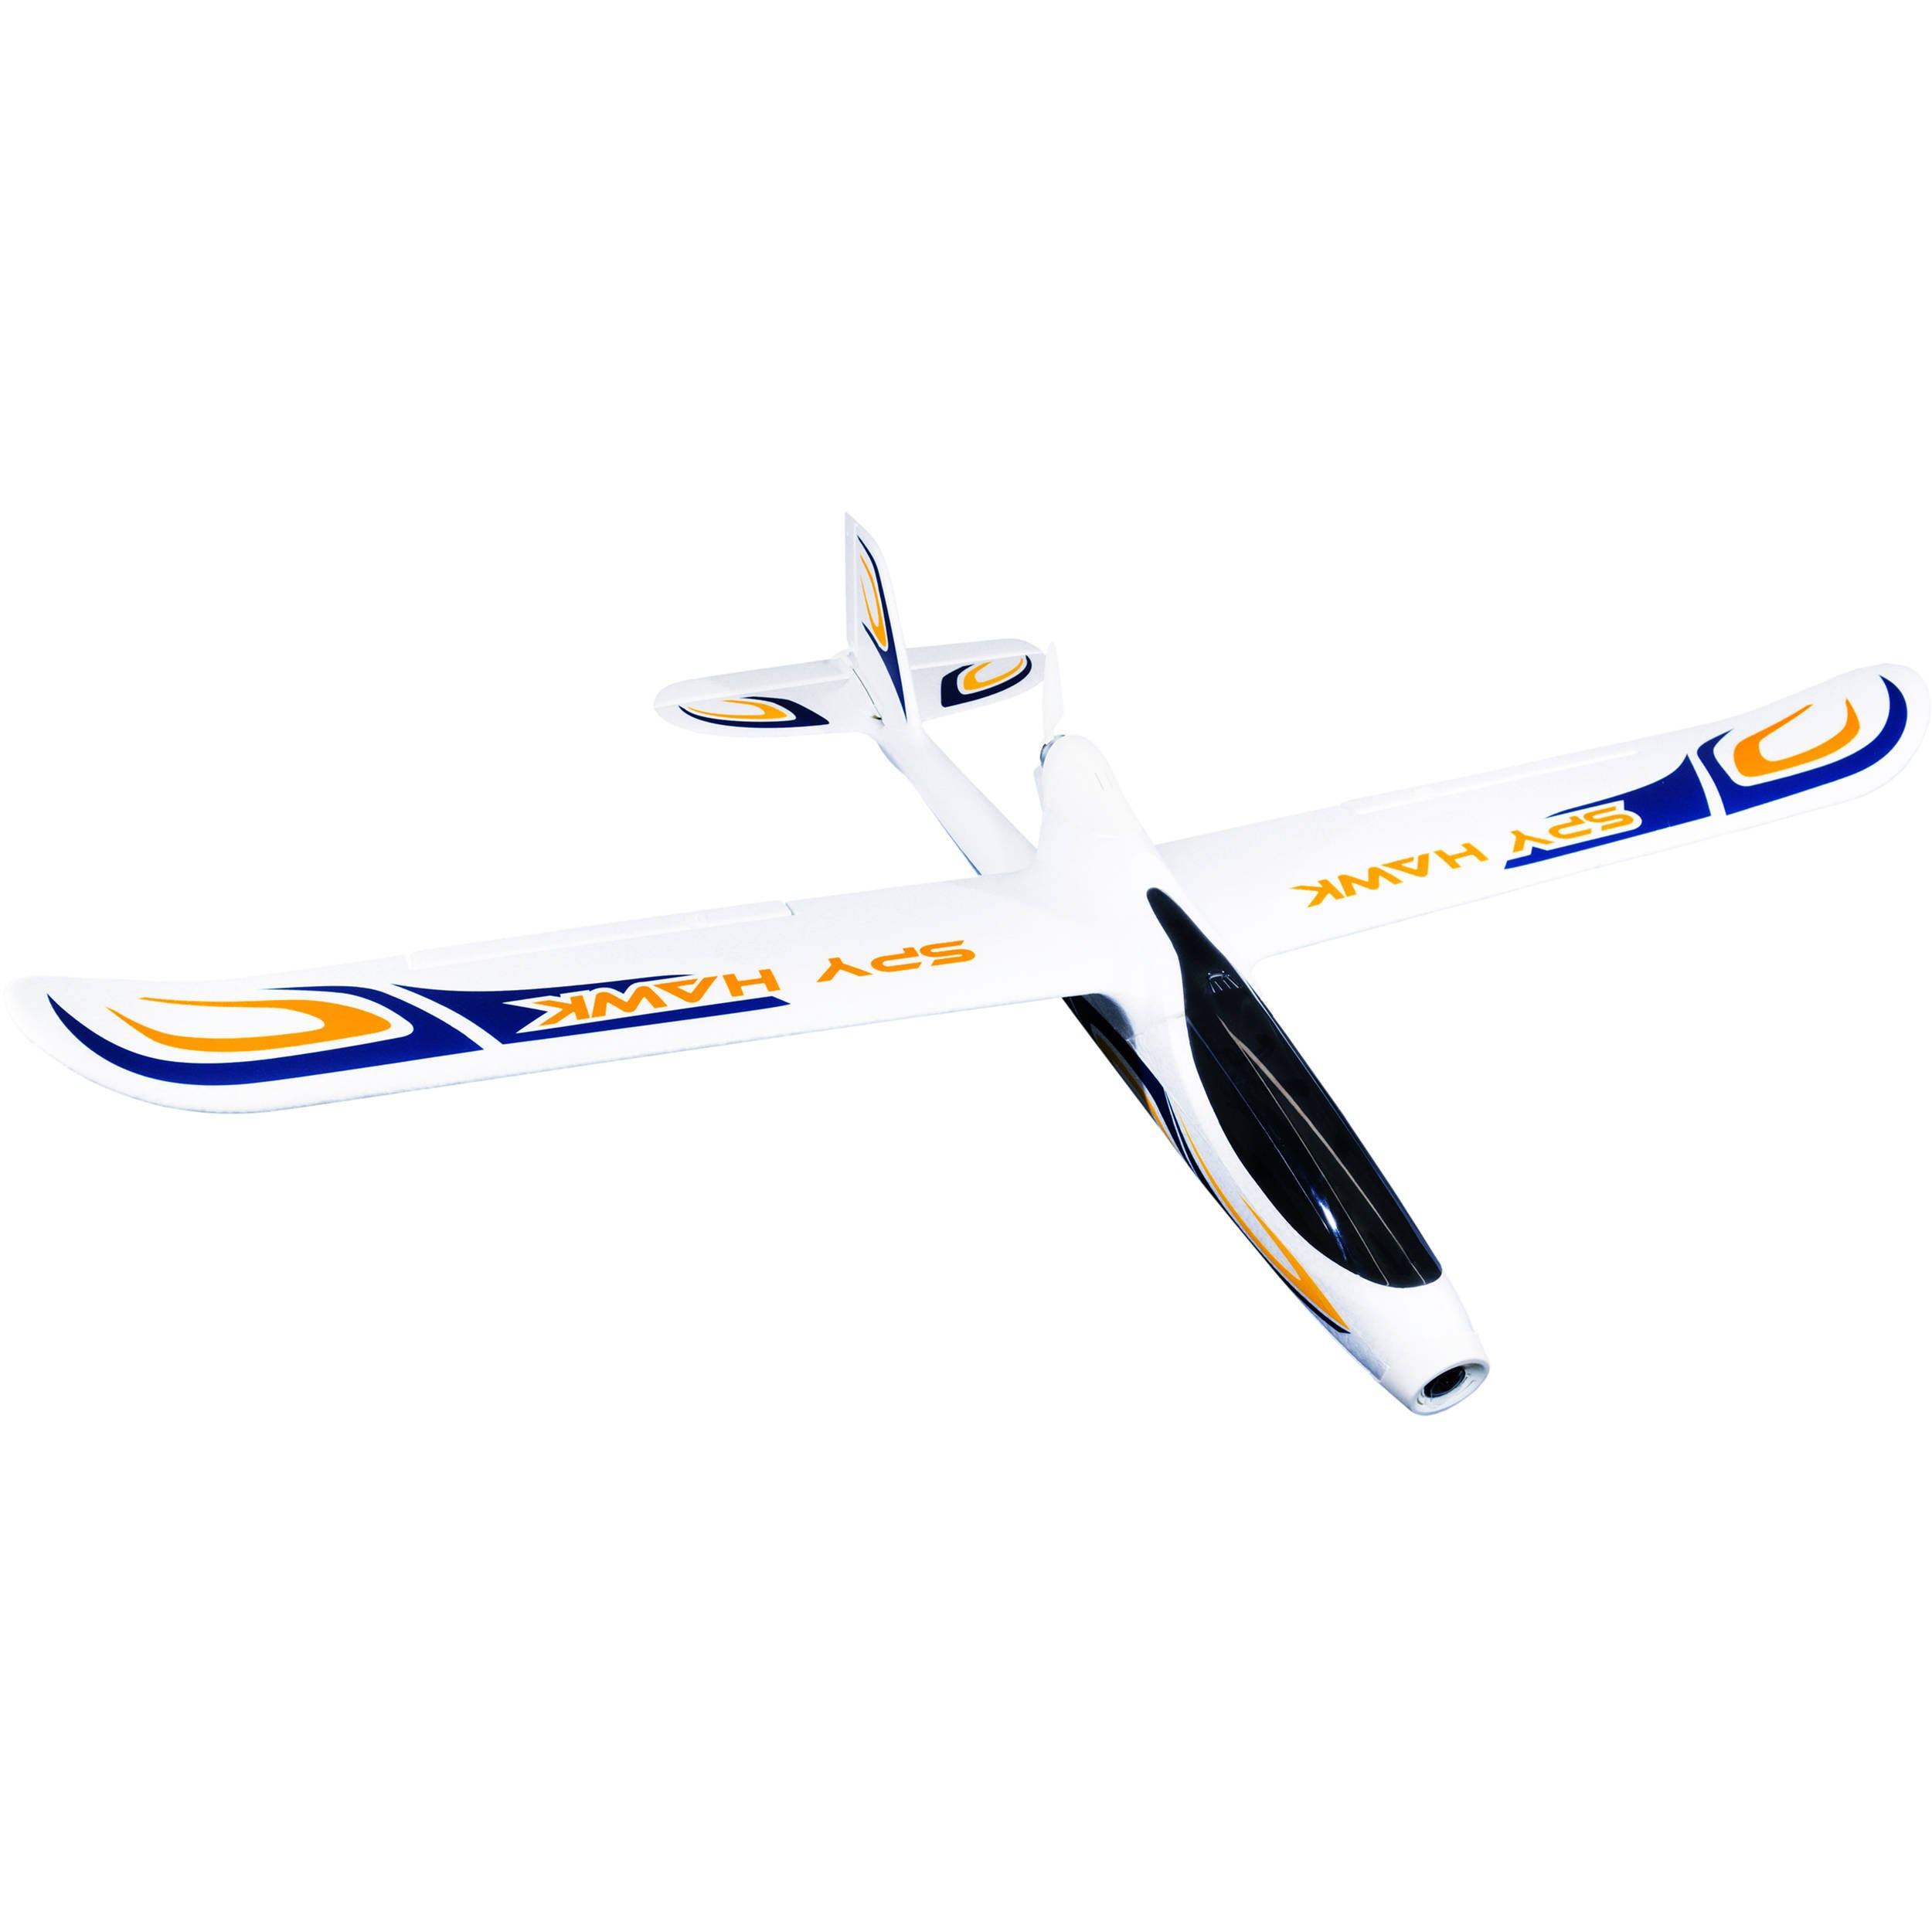 Hubsan H301S Spy Hawk RC Airplane